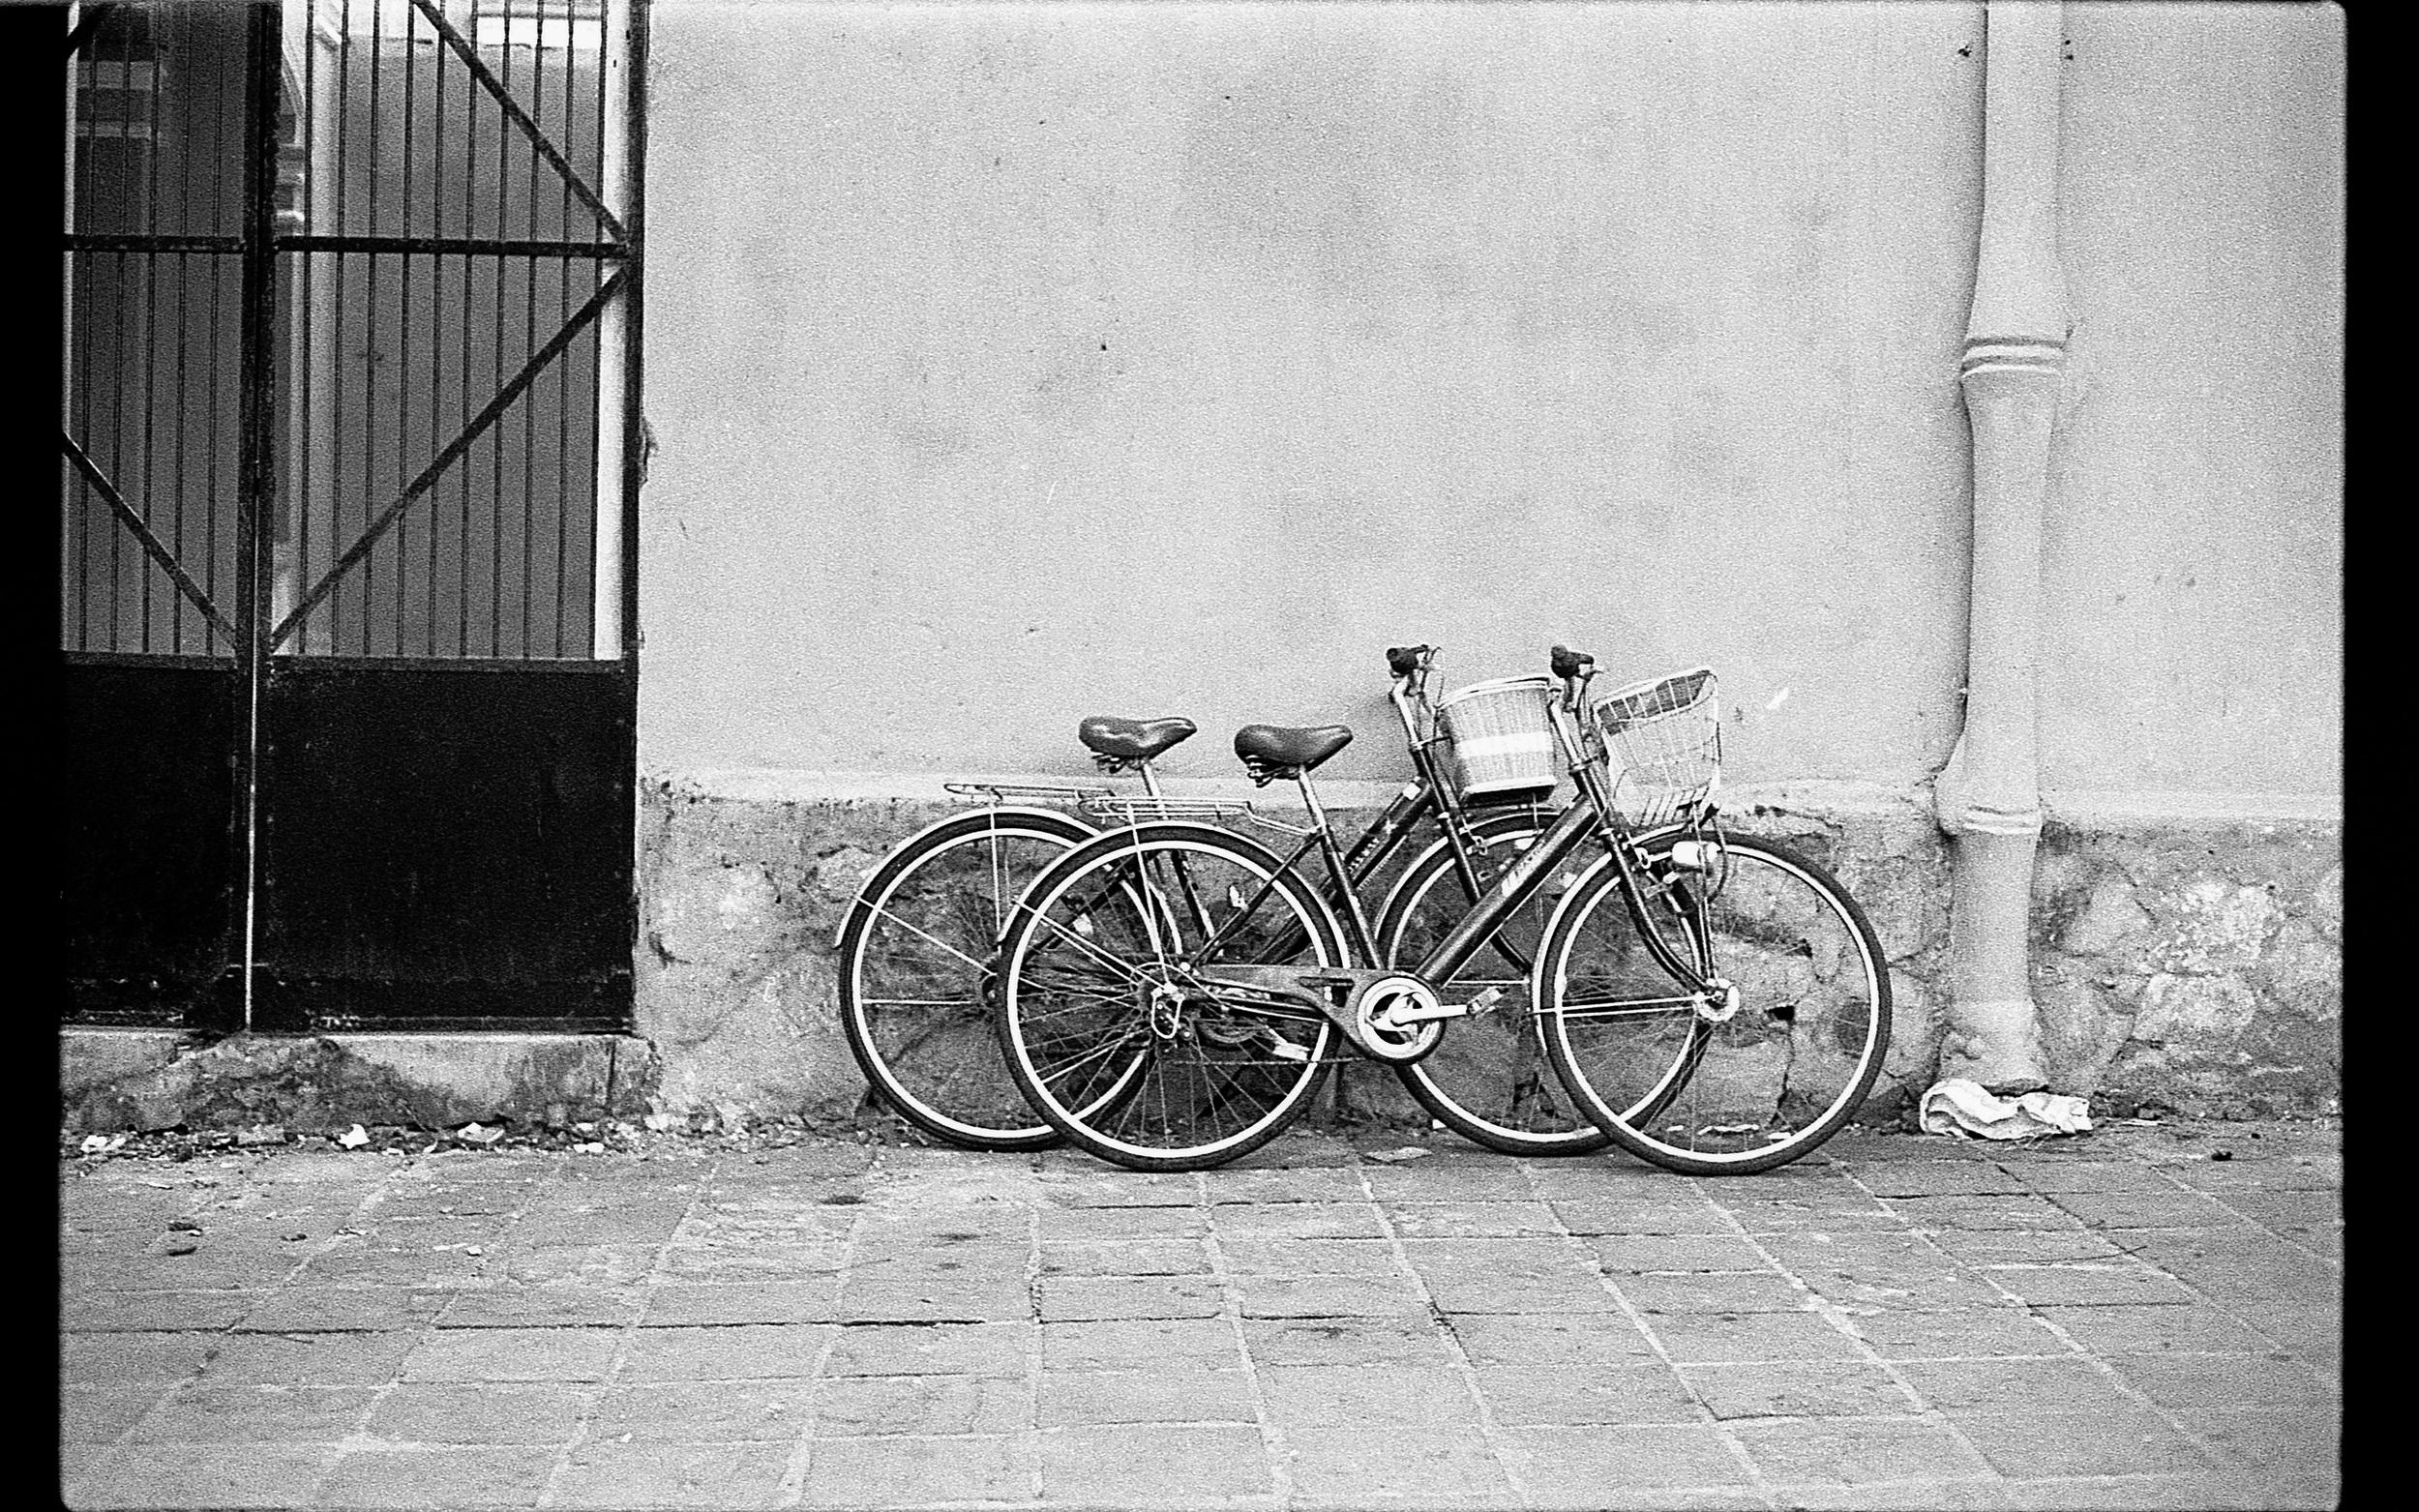 School bikes